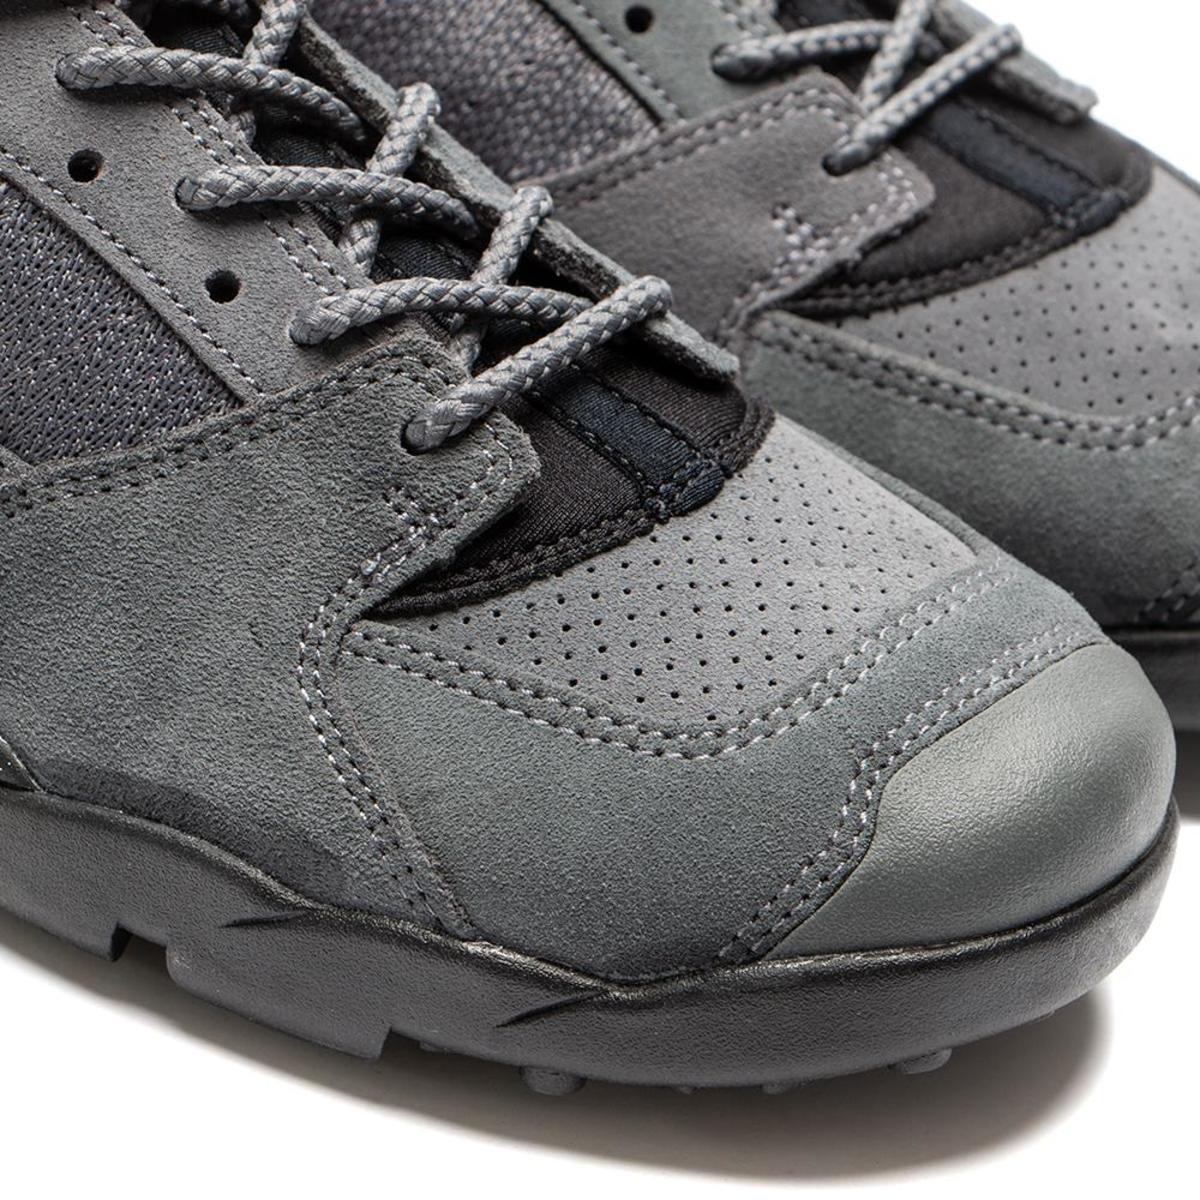 quality design 6de82 6958d Nike ACG Air Revaderchi Flint Grey   Black   Garmentory